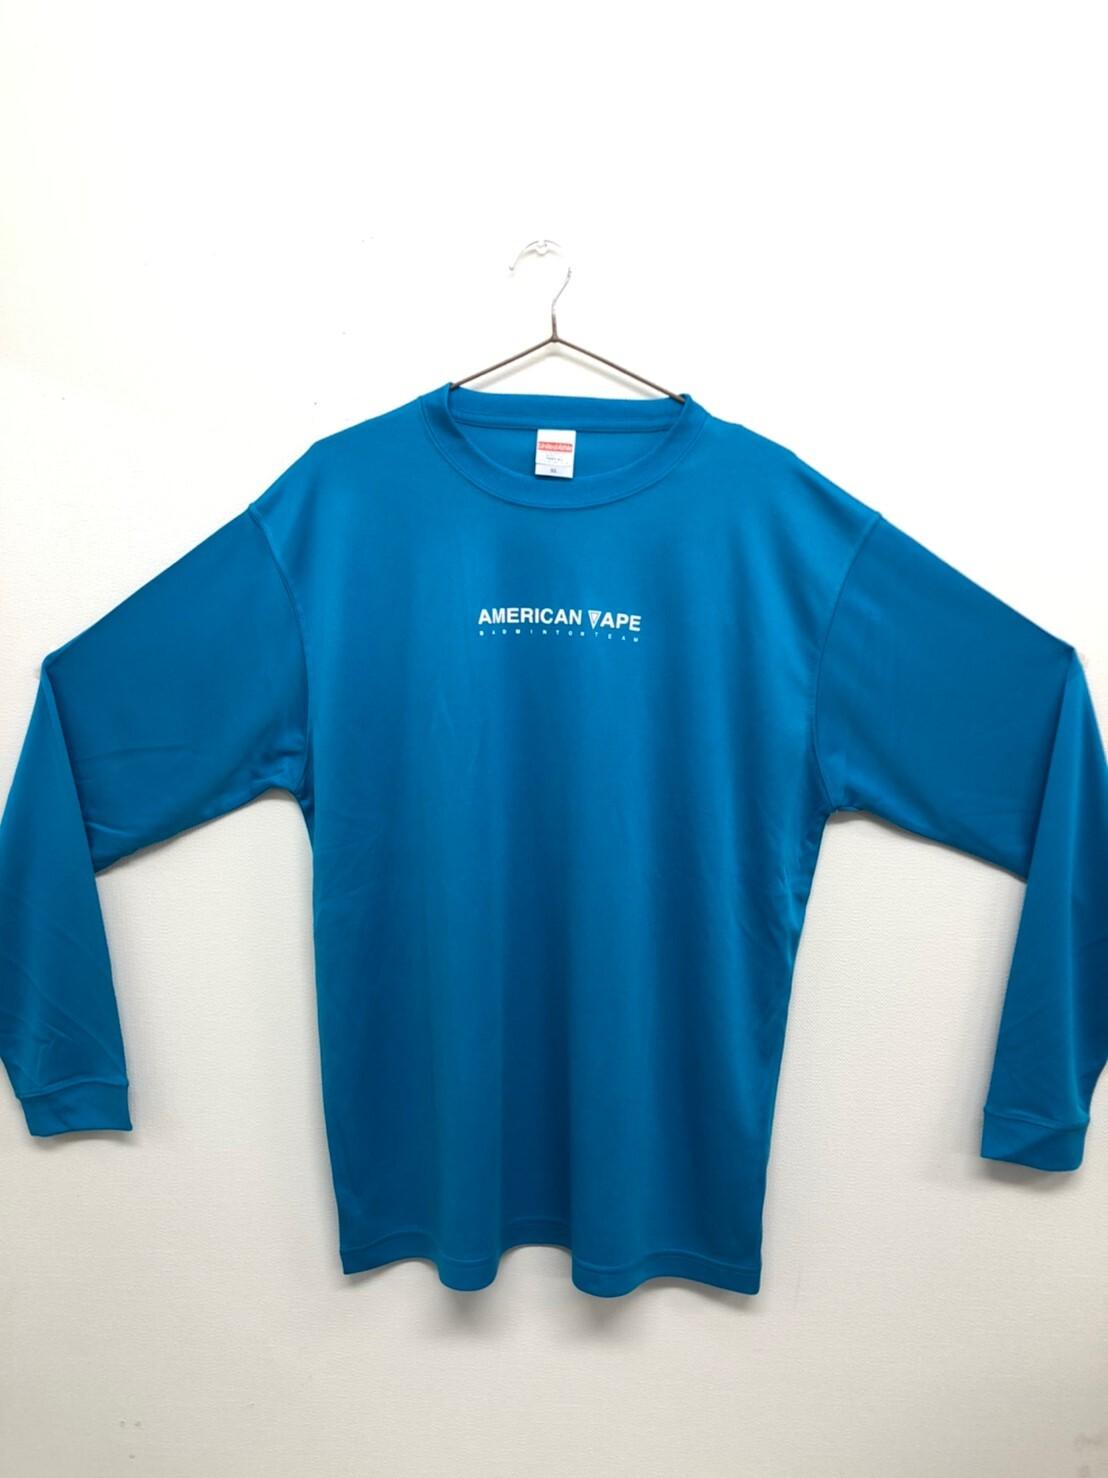 2019 S/Jリーグ戦記念オリジナルロングTシャツ(ターコイズブルー)